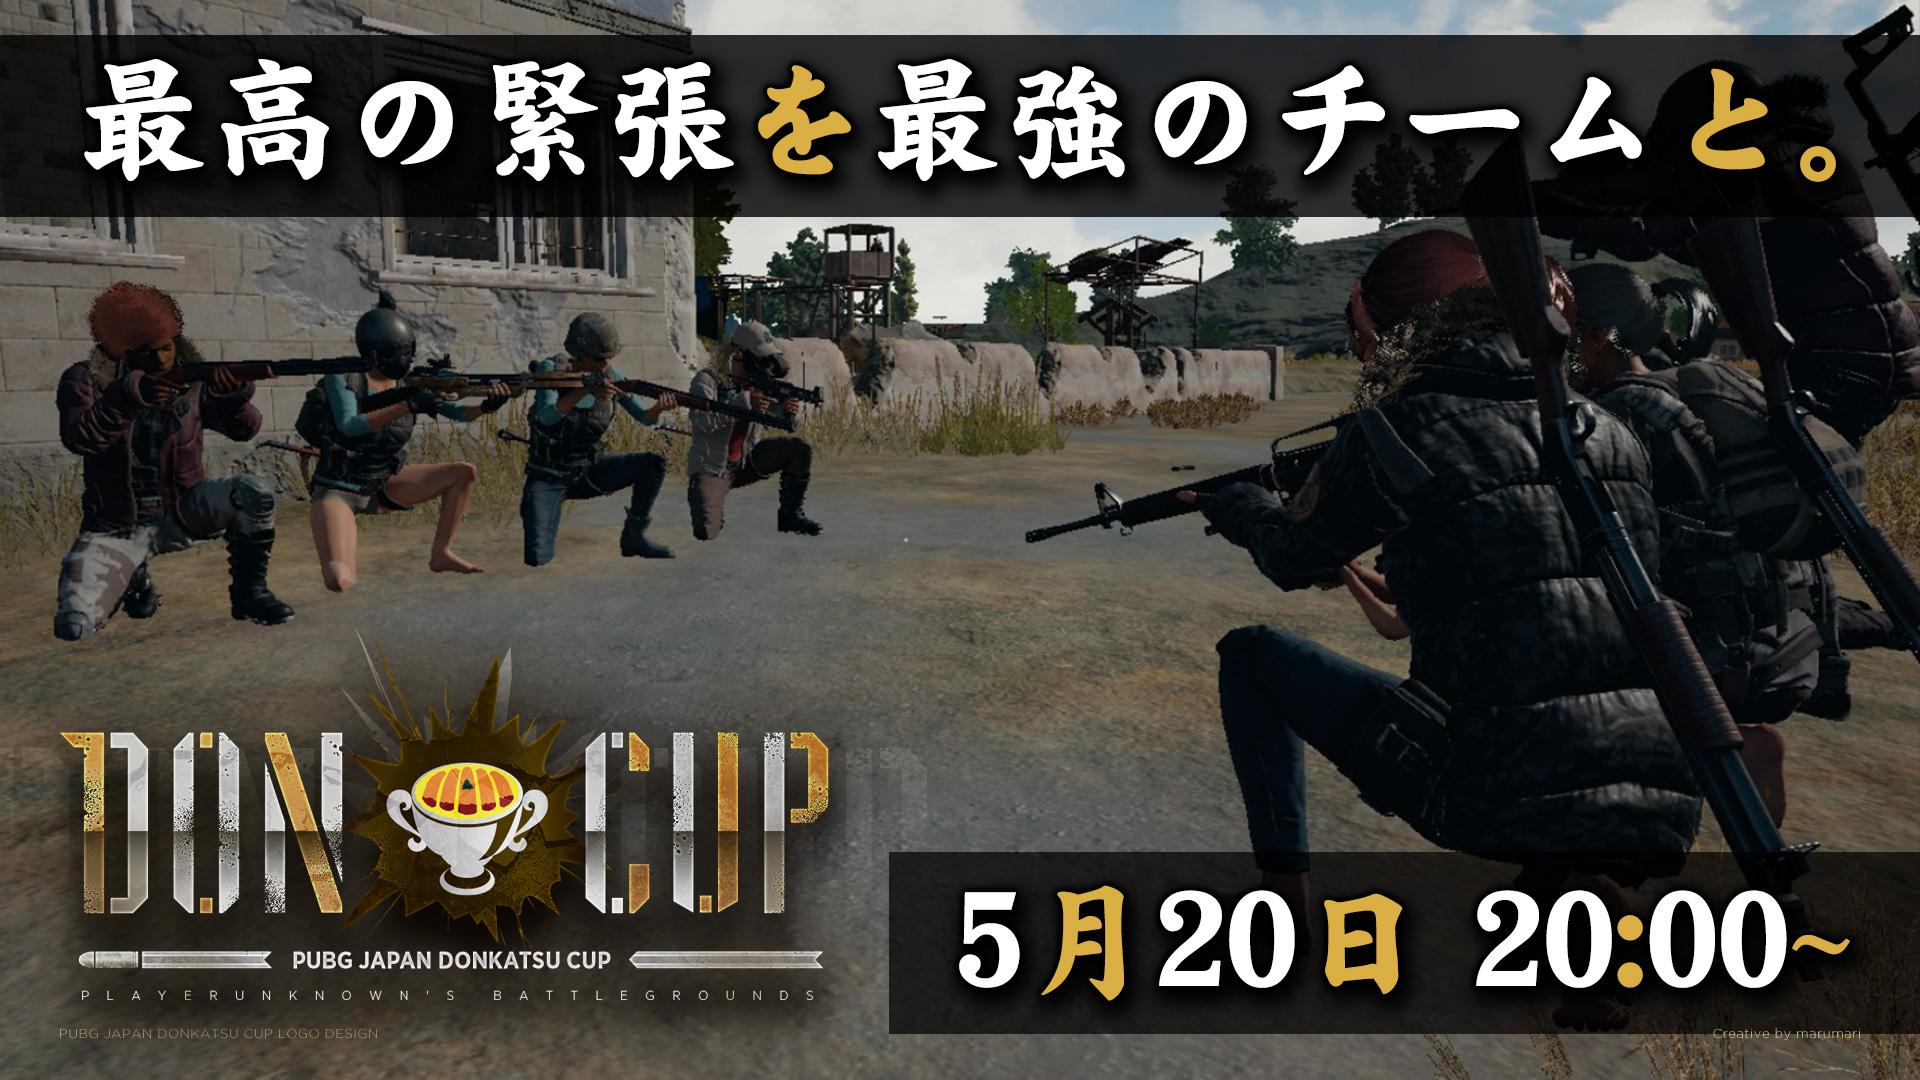 5月20日 PUBGJAPAN DONKATSU CUP SQUAD 開催予定